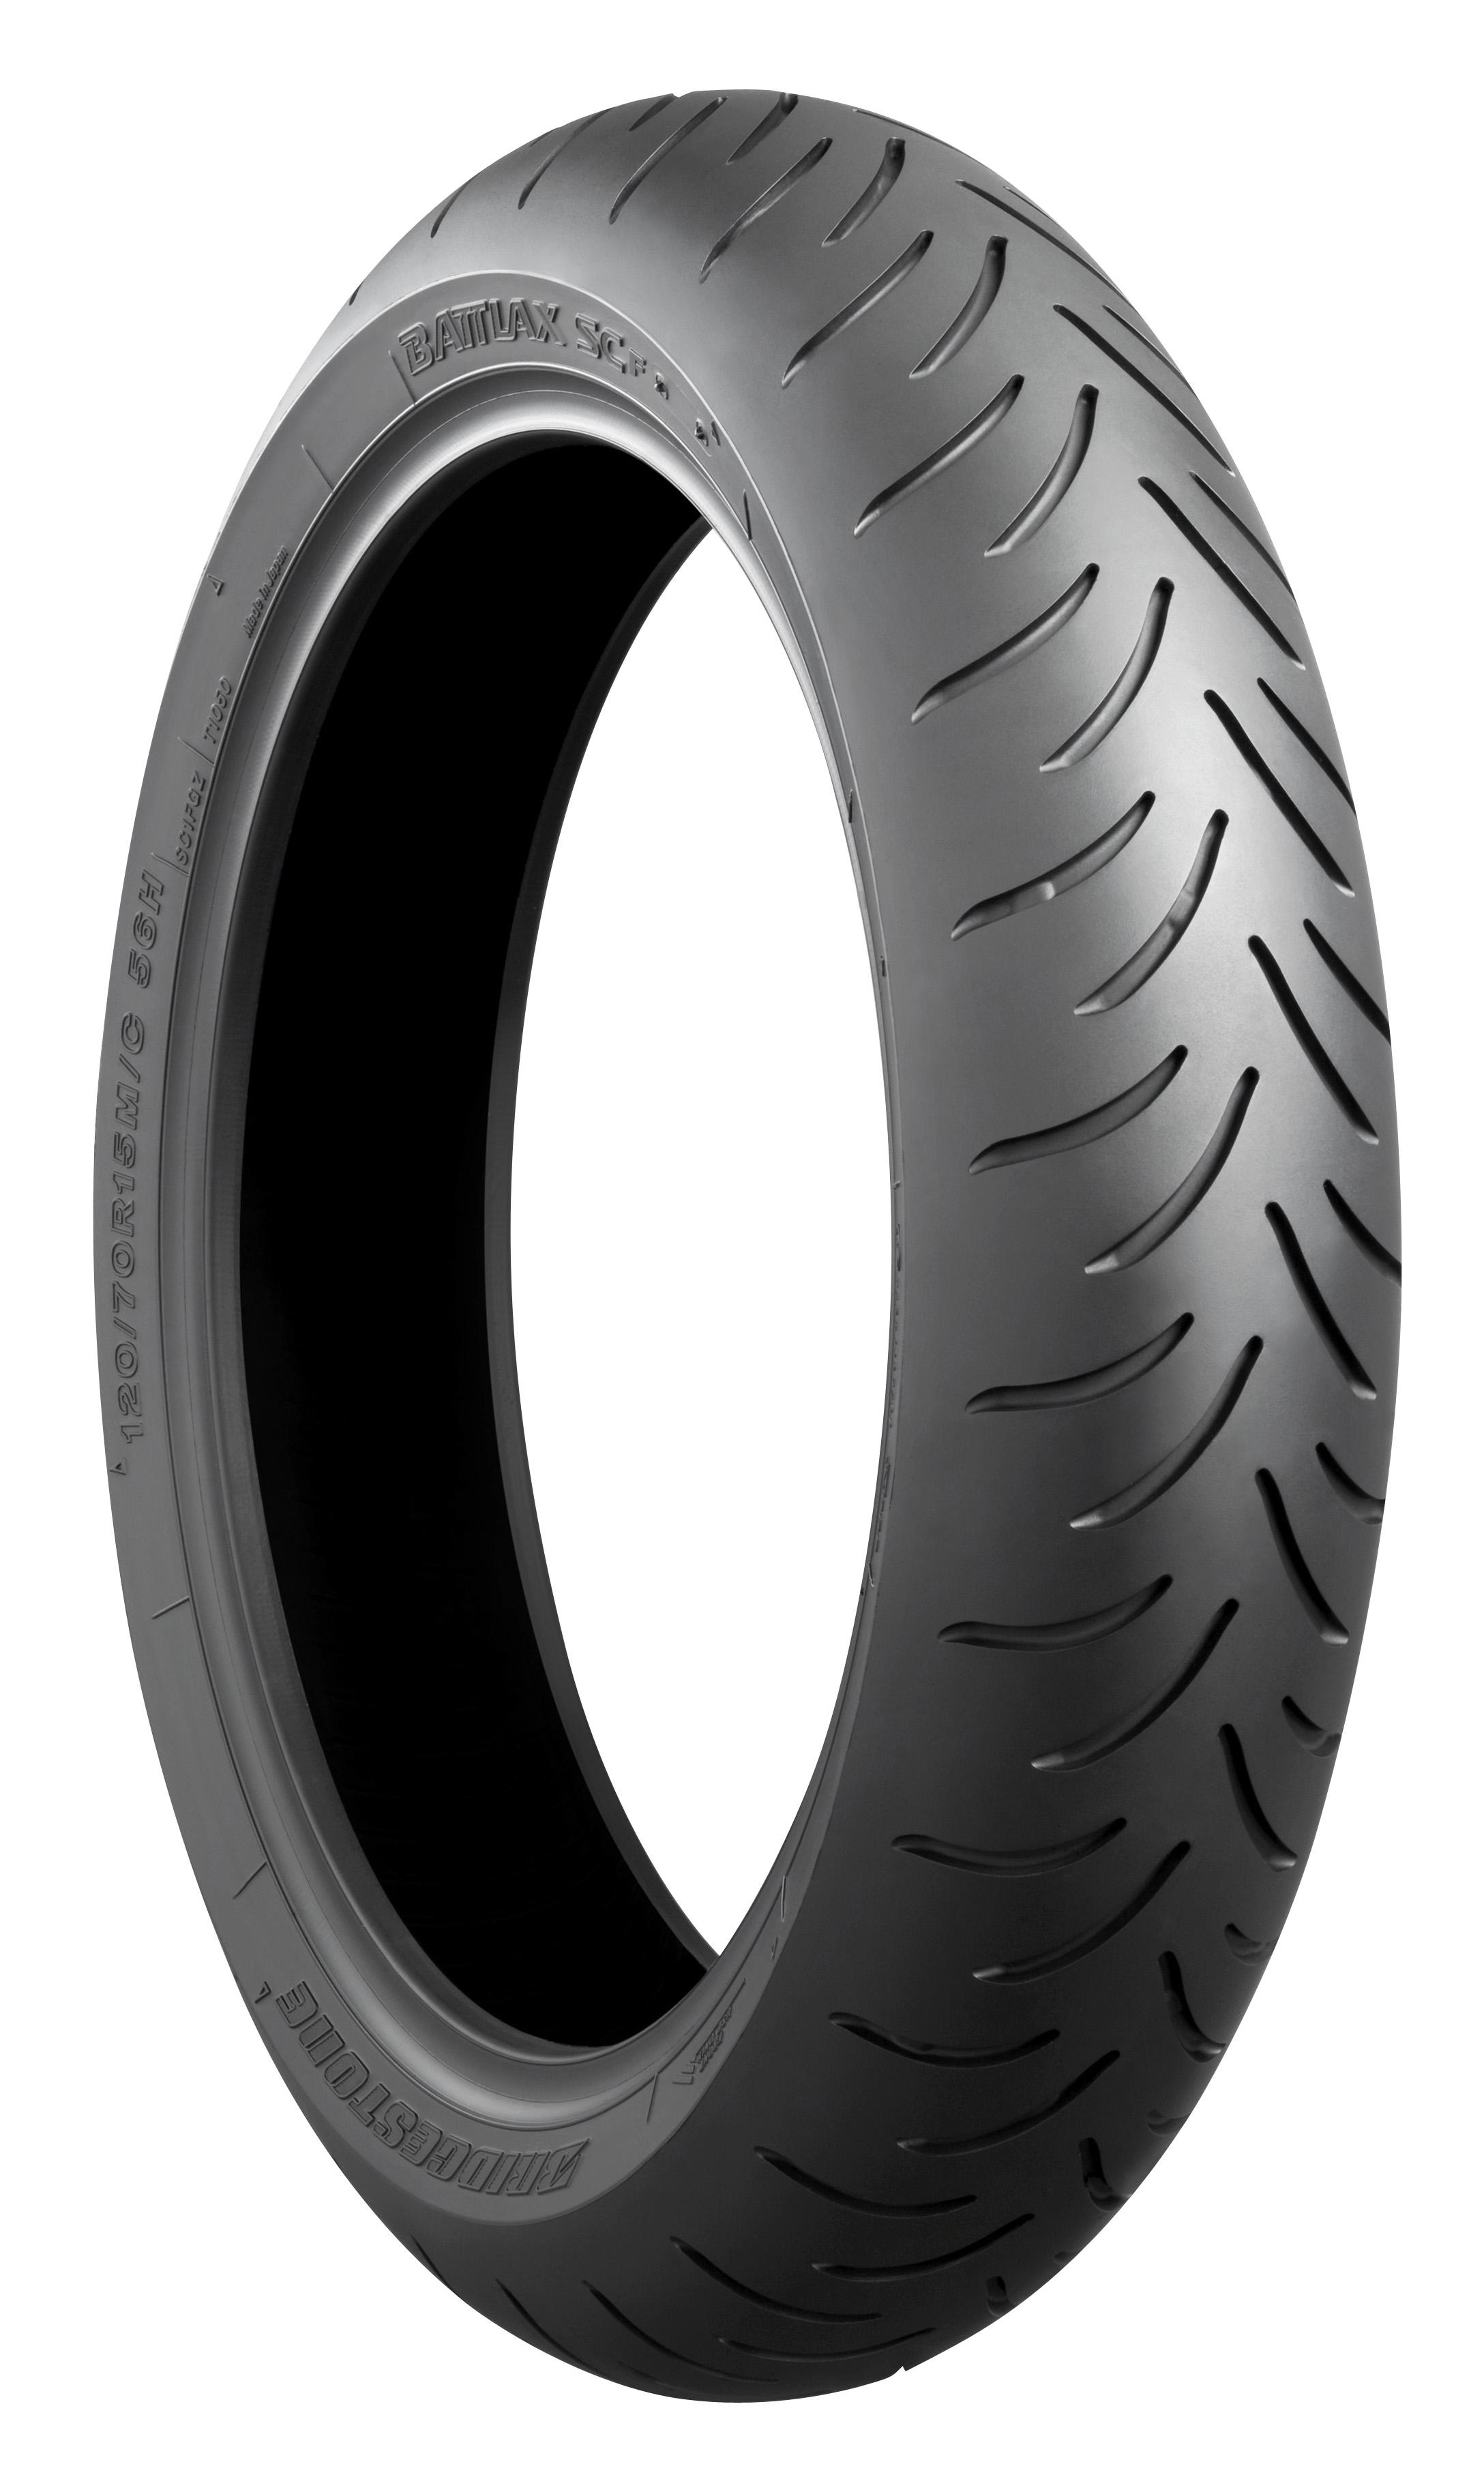 Bridgestone Battlax Scooter SC 120/70S15 (56S) Bias Front Tyre